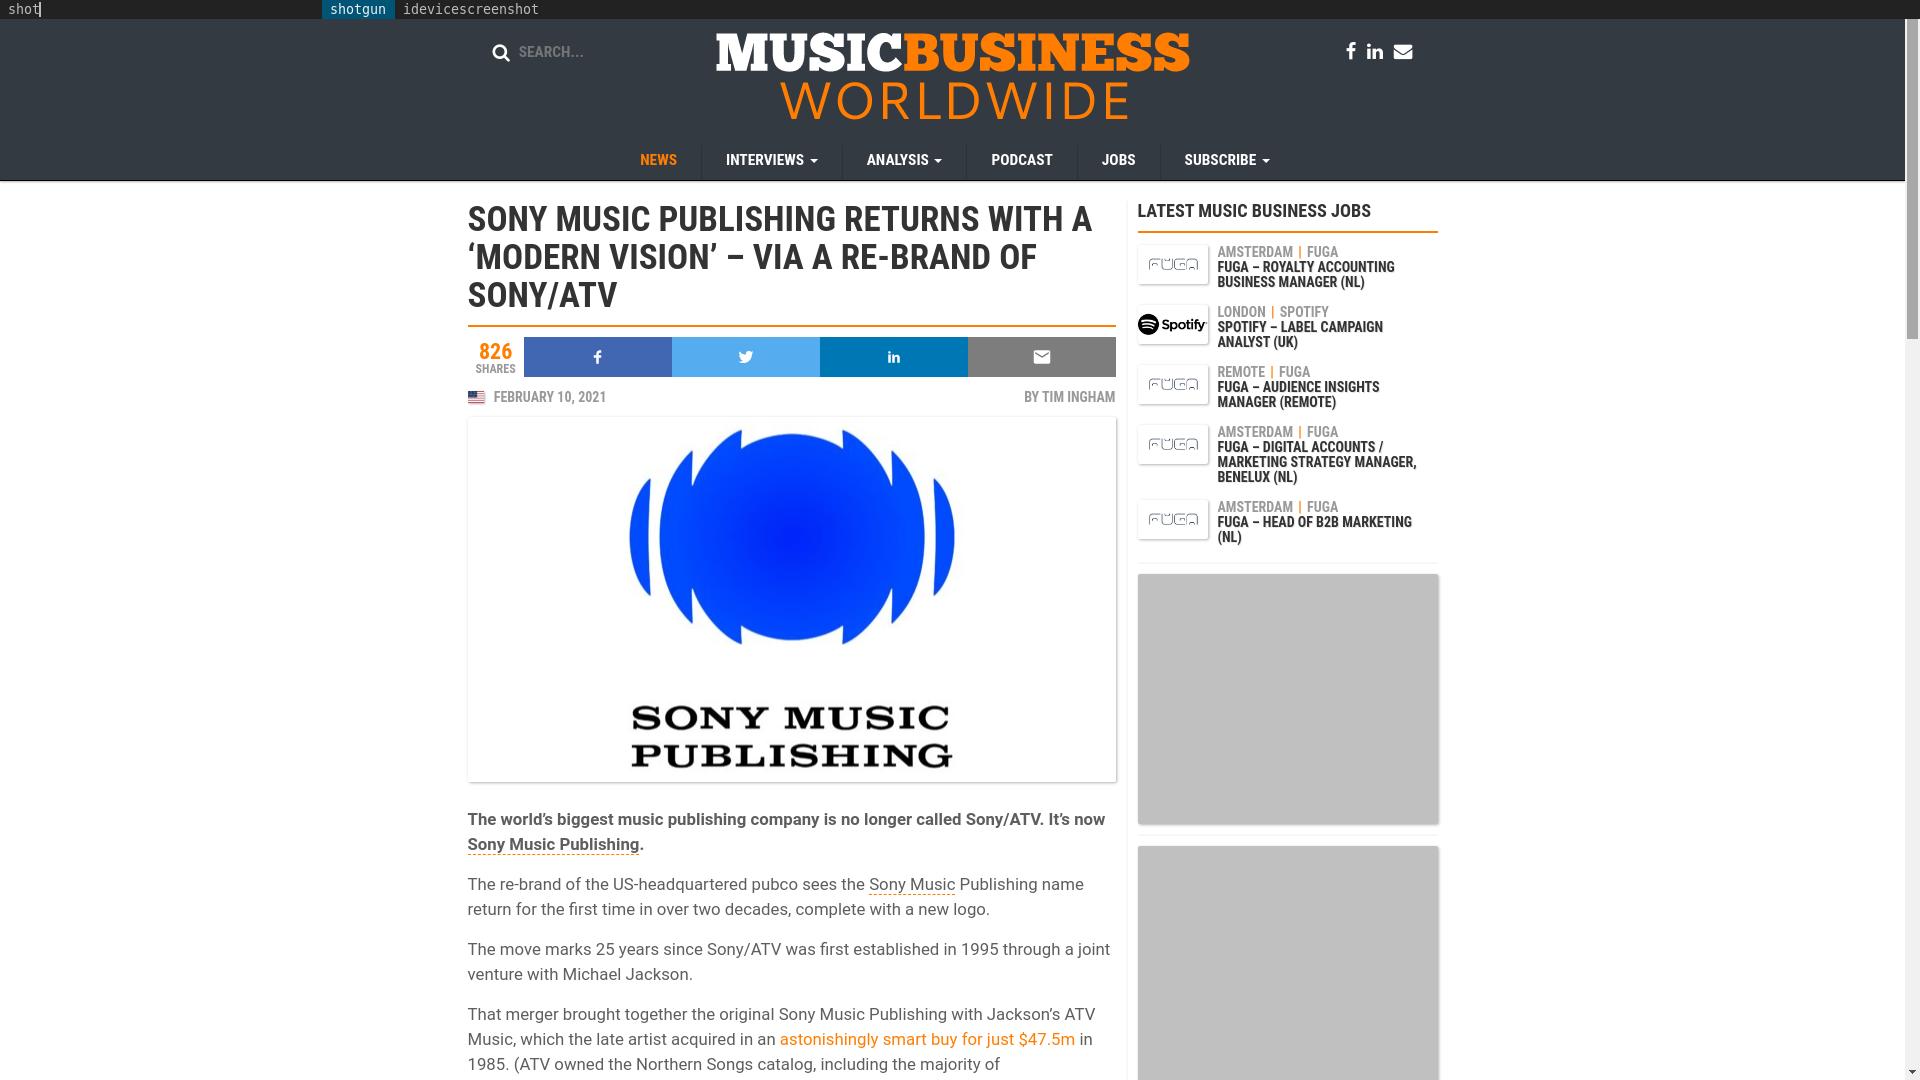 Fairness Rocks News SONY MUSIC PUBLISHING RETURNS WITH A 'MODERN VISION' – VIA A RE-BRAND OF SONY/ATV